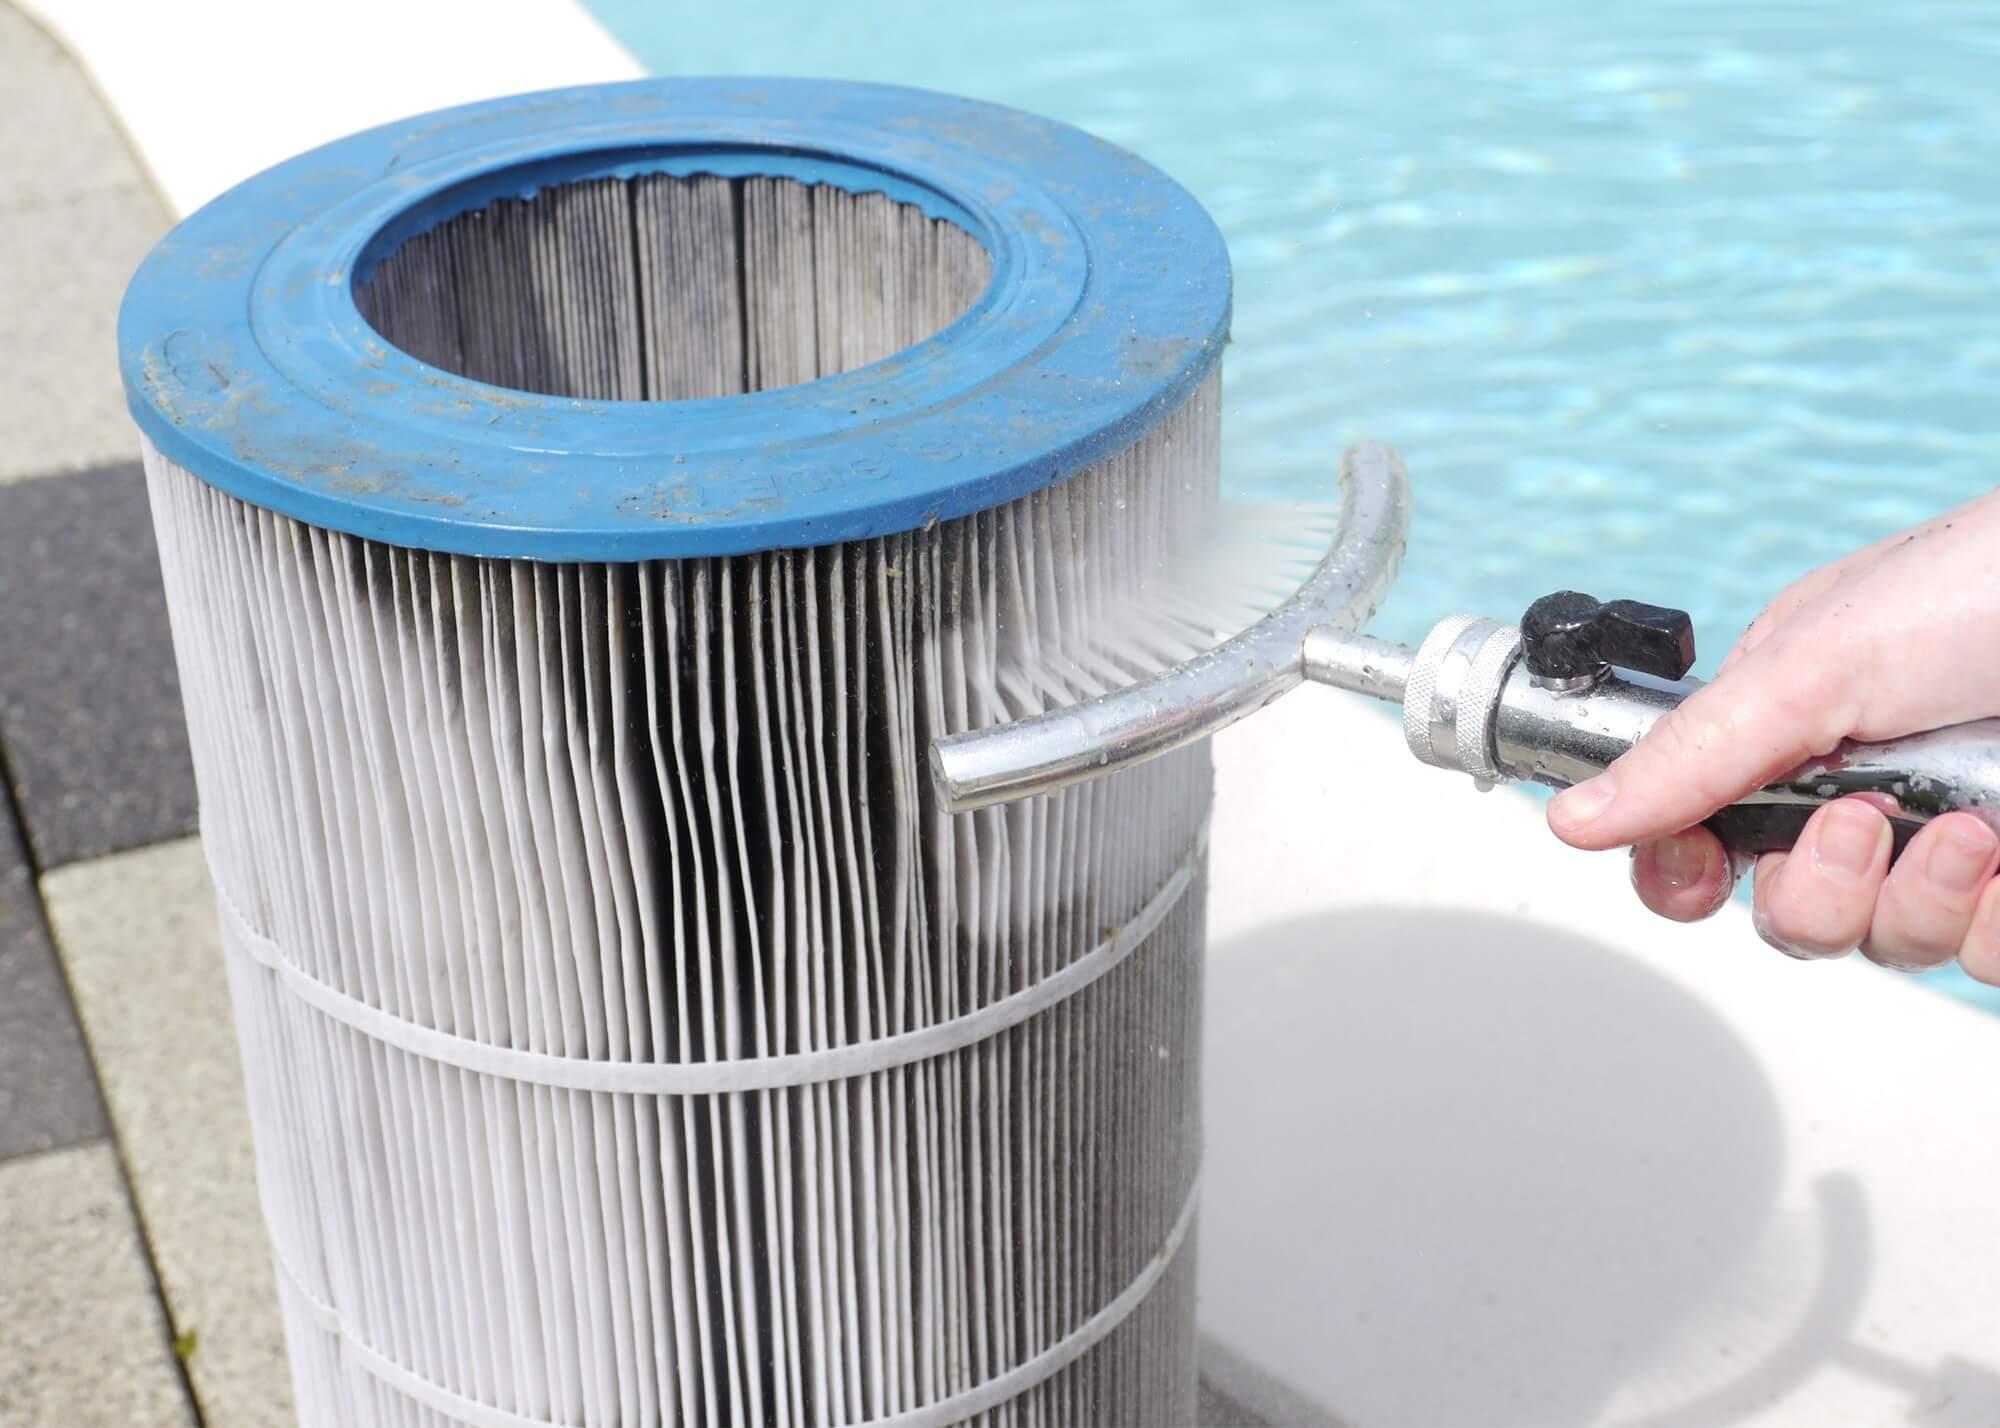 Nettoyeur de cartouches piscines waterair for Filtre piscine waterair